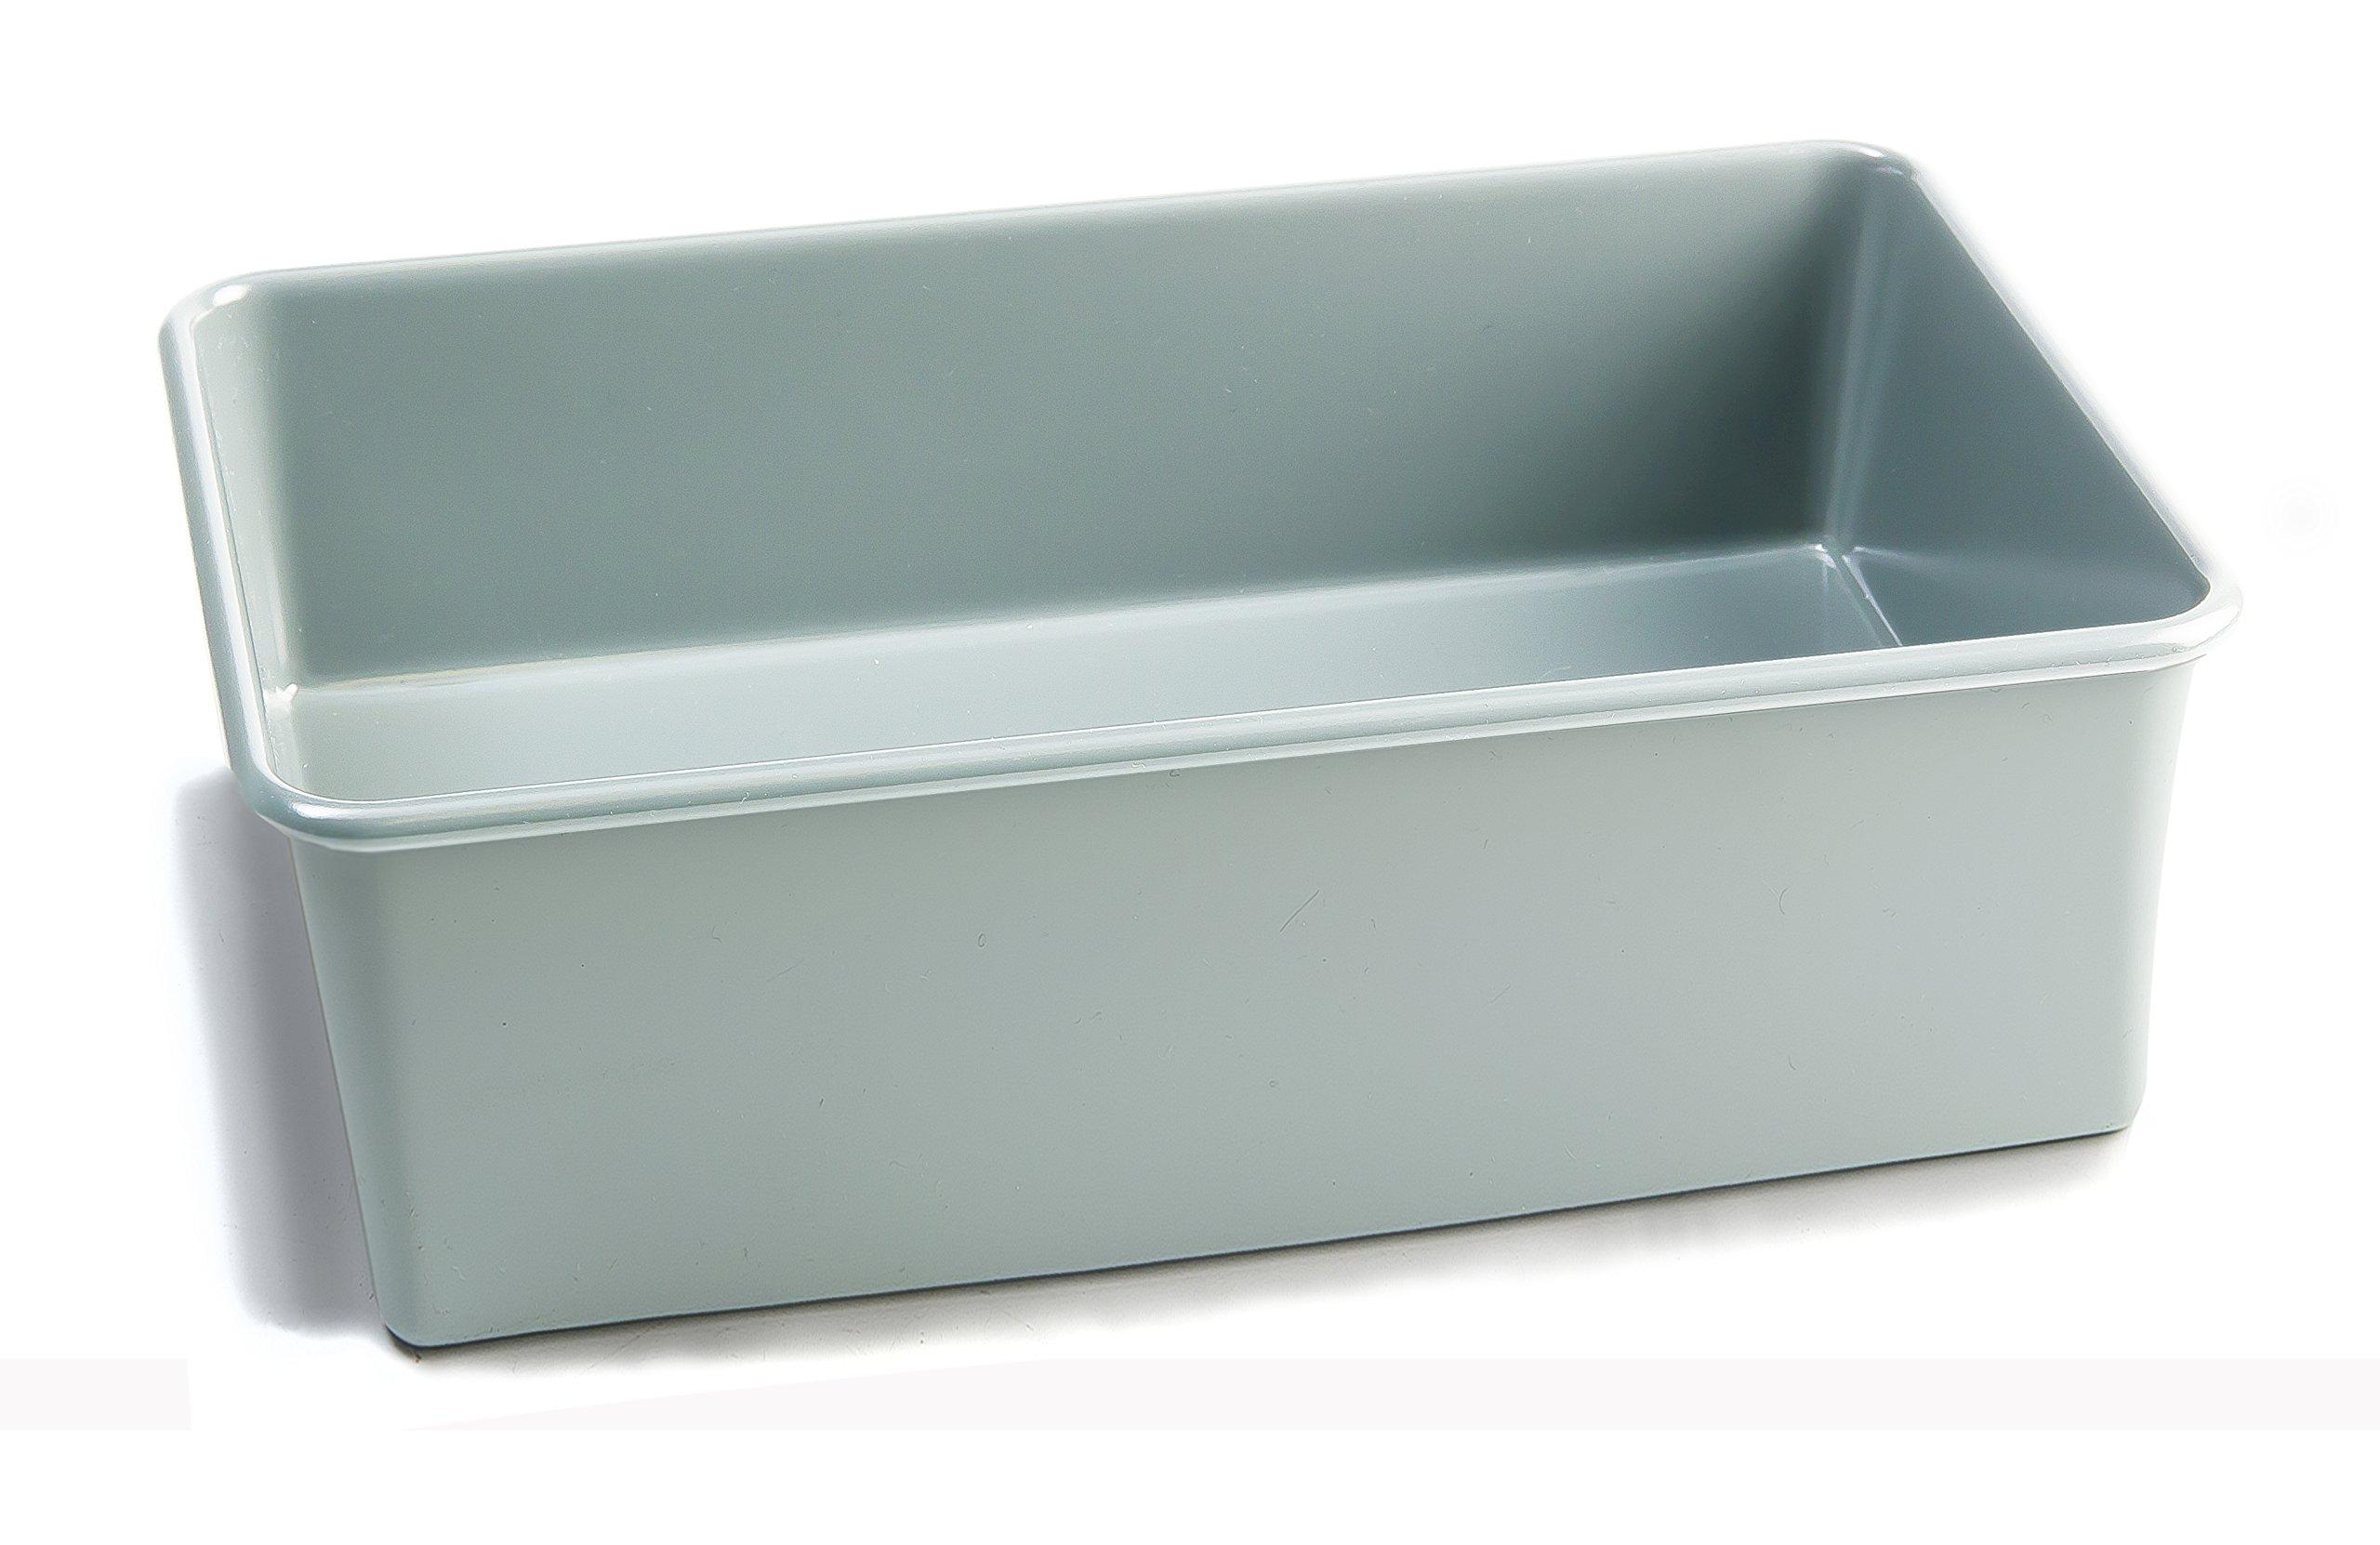 Kaiser 20-30cm Adjustable Loaf Tin Uk Post Free Cookware, Dining & Bar